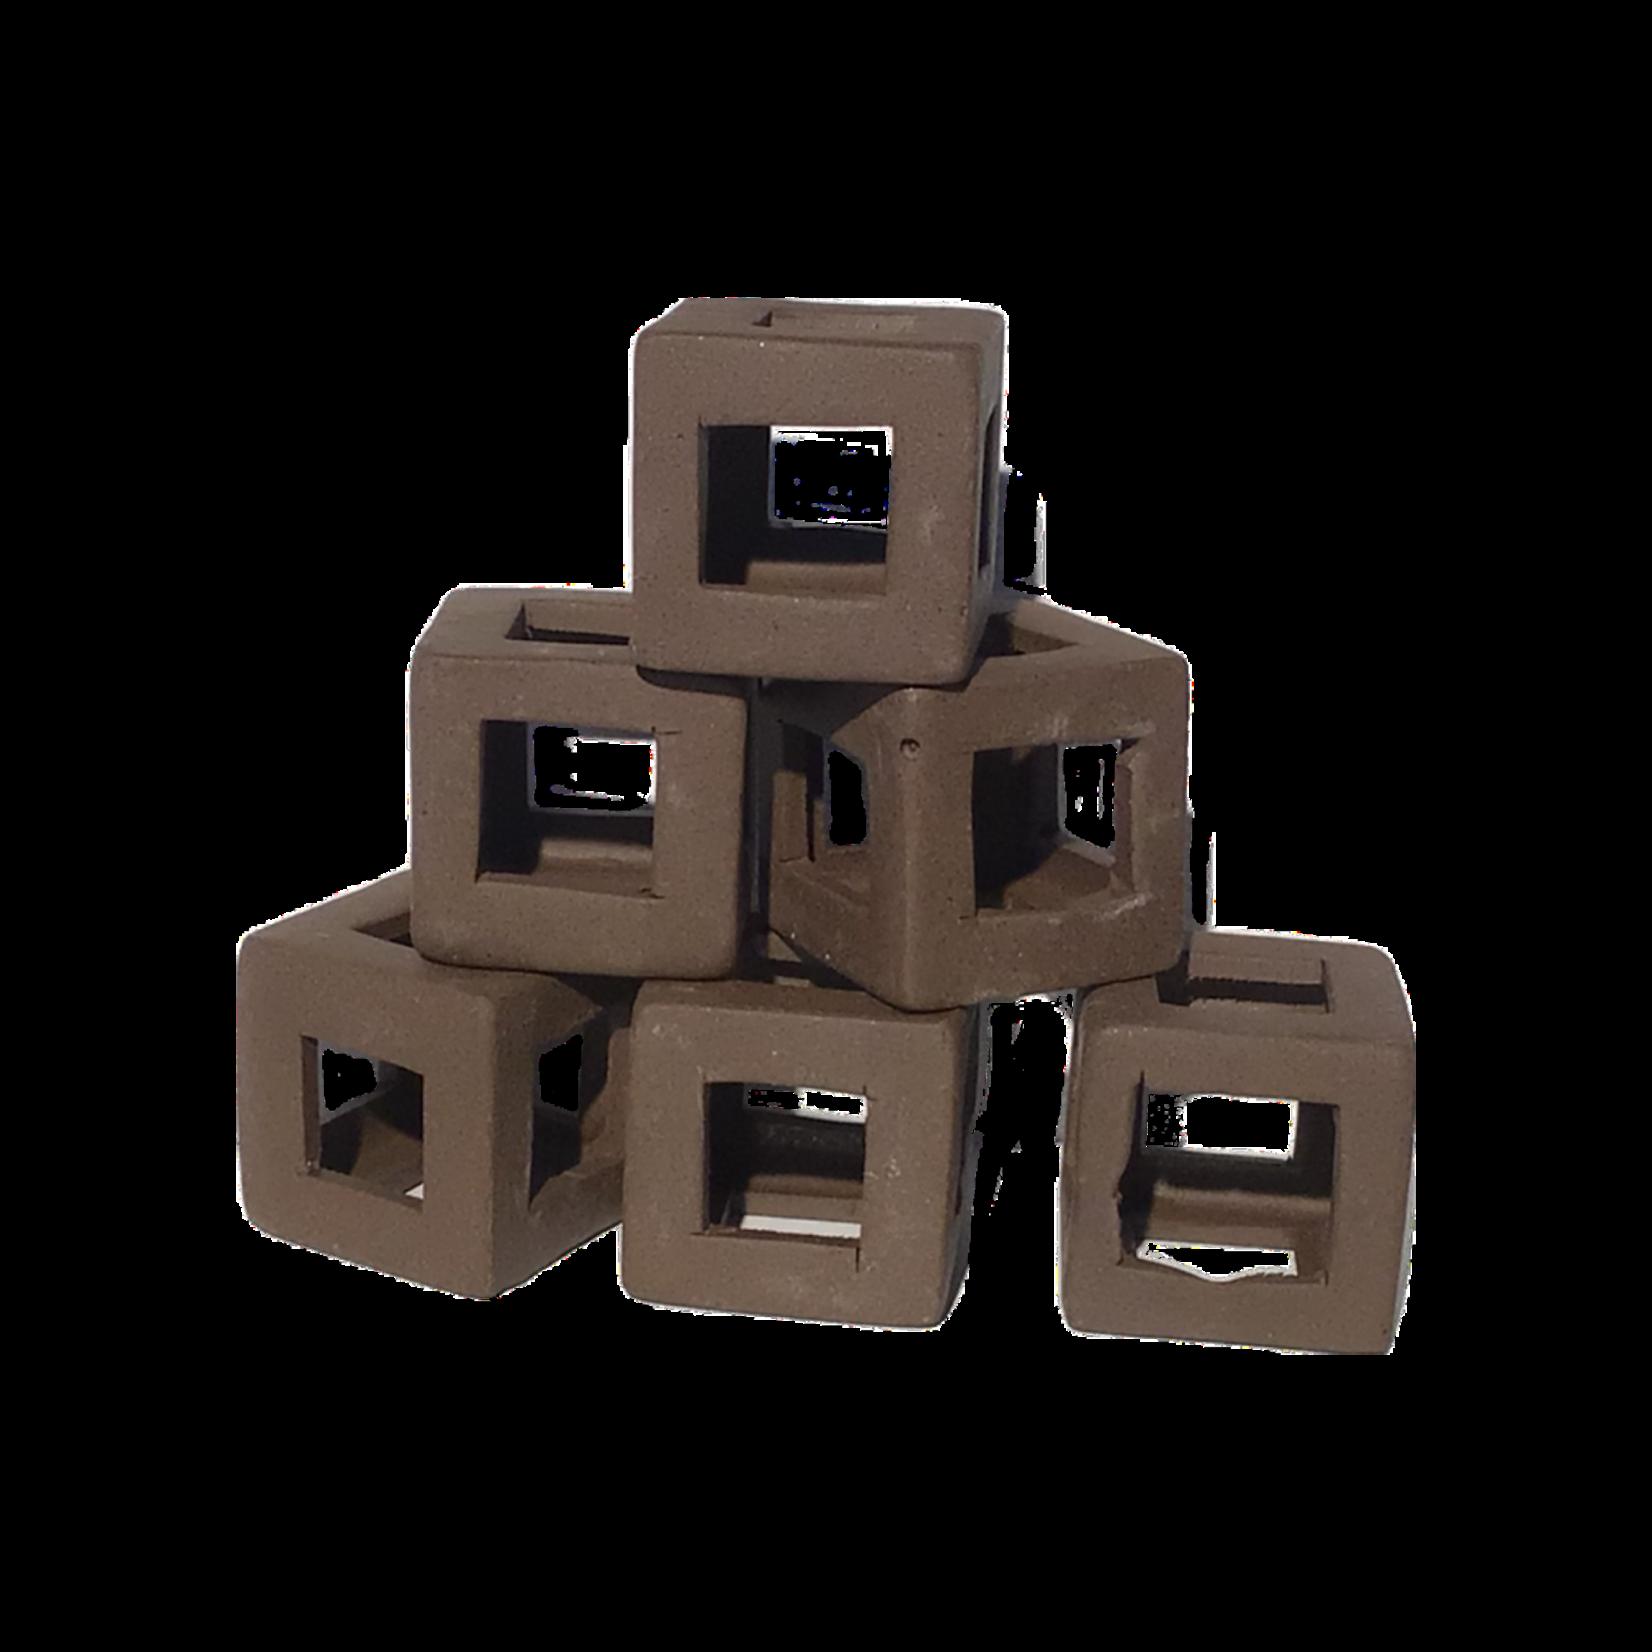 Bubba Keramische kubus 2x2x2cm (1st)